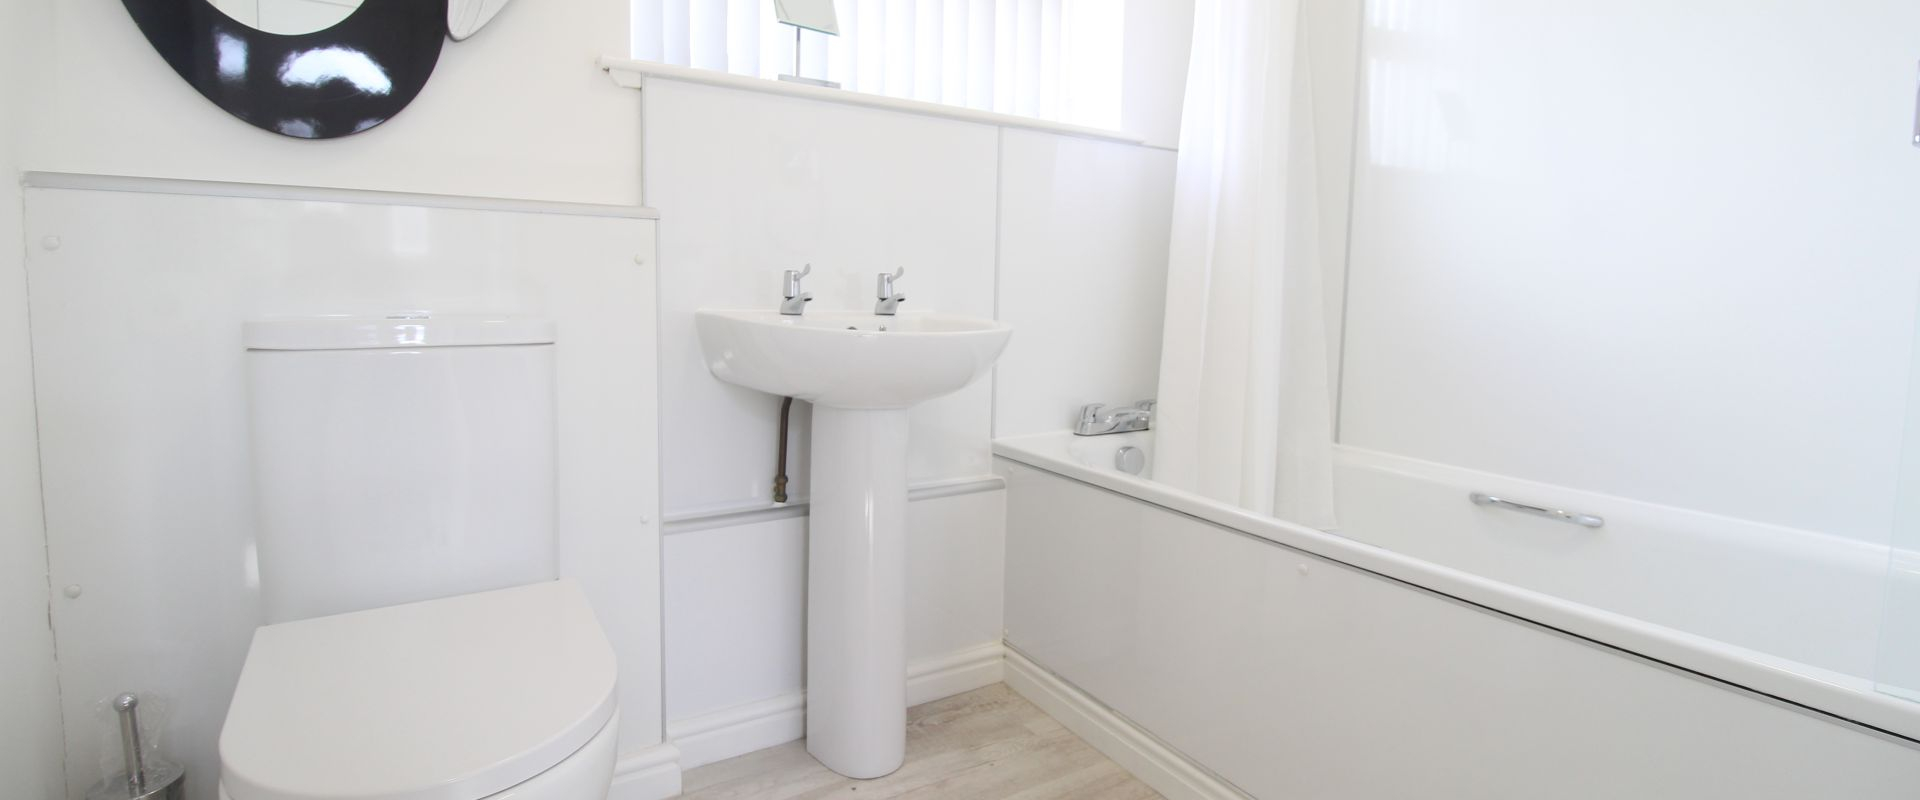 ARD-Properties-Development-Sites-Buy-Homes-Rent-Aberdeenshire-Rentals-Apartment-C-Loanhead-Terrace-Aberdeen-Banner (6)